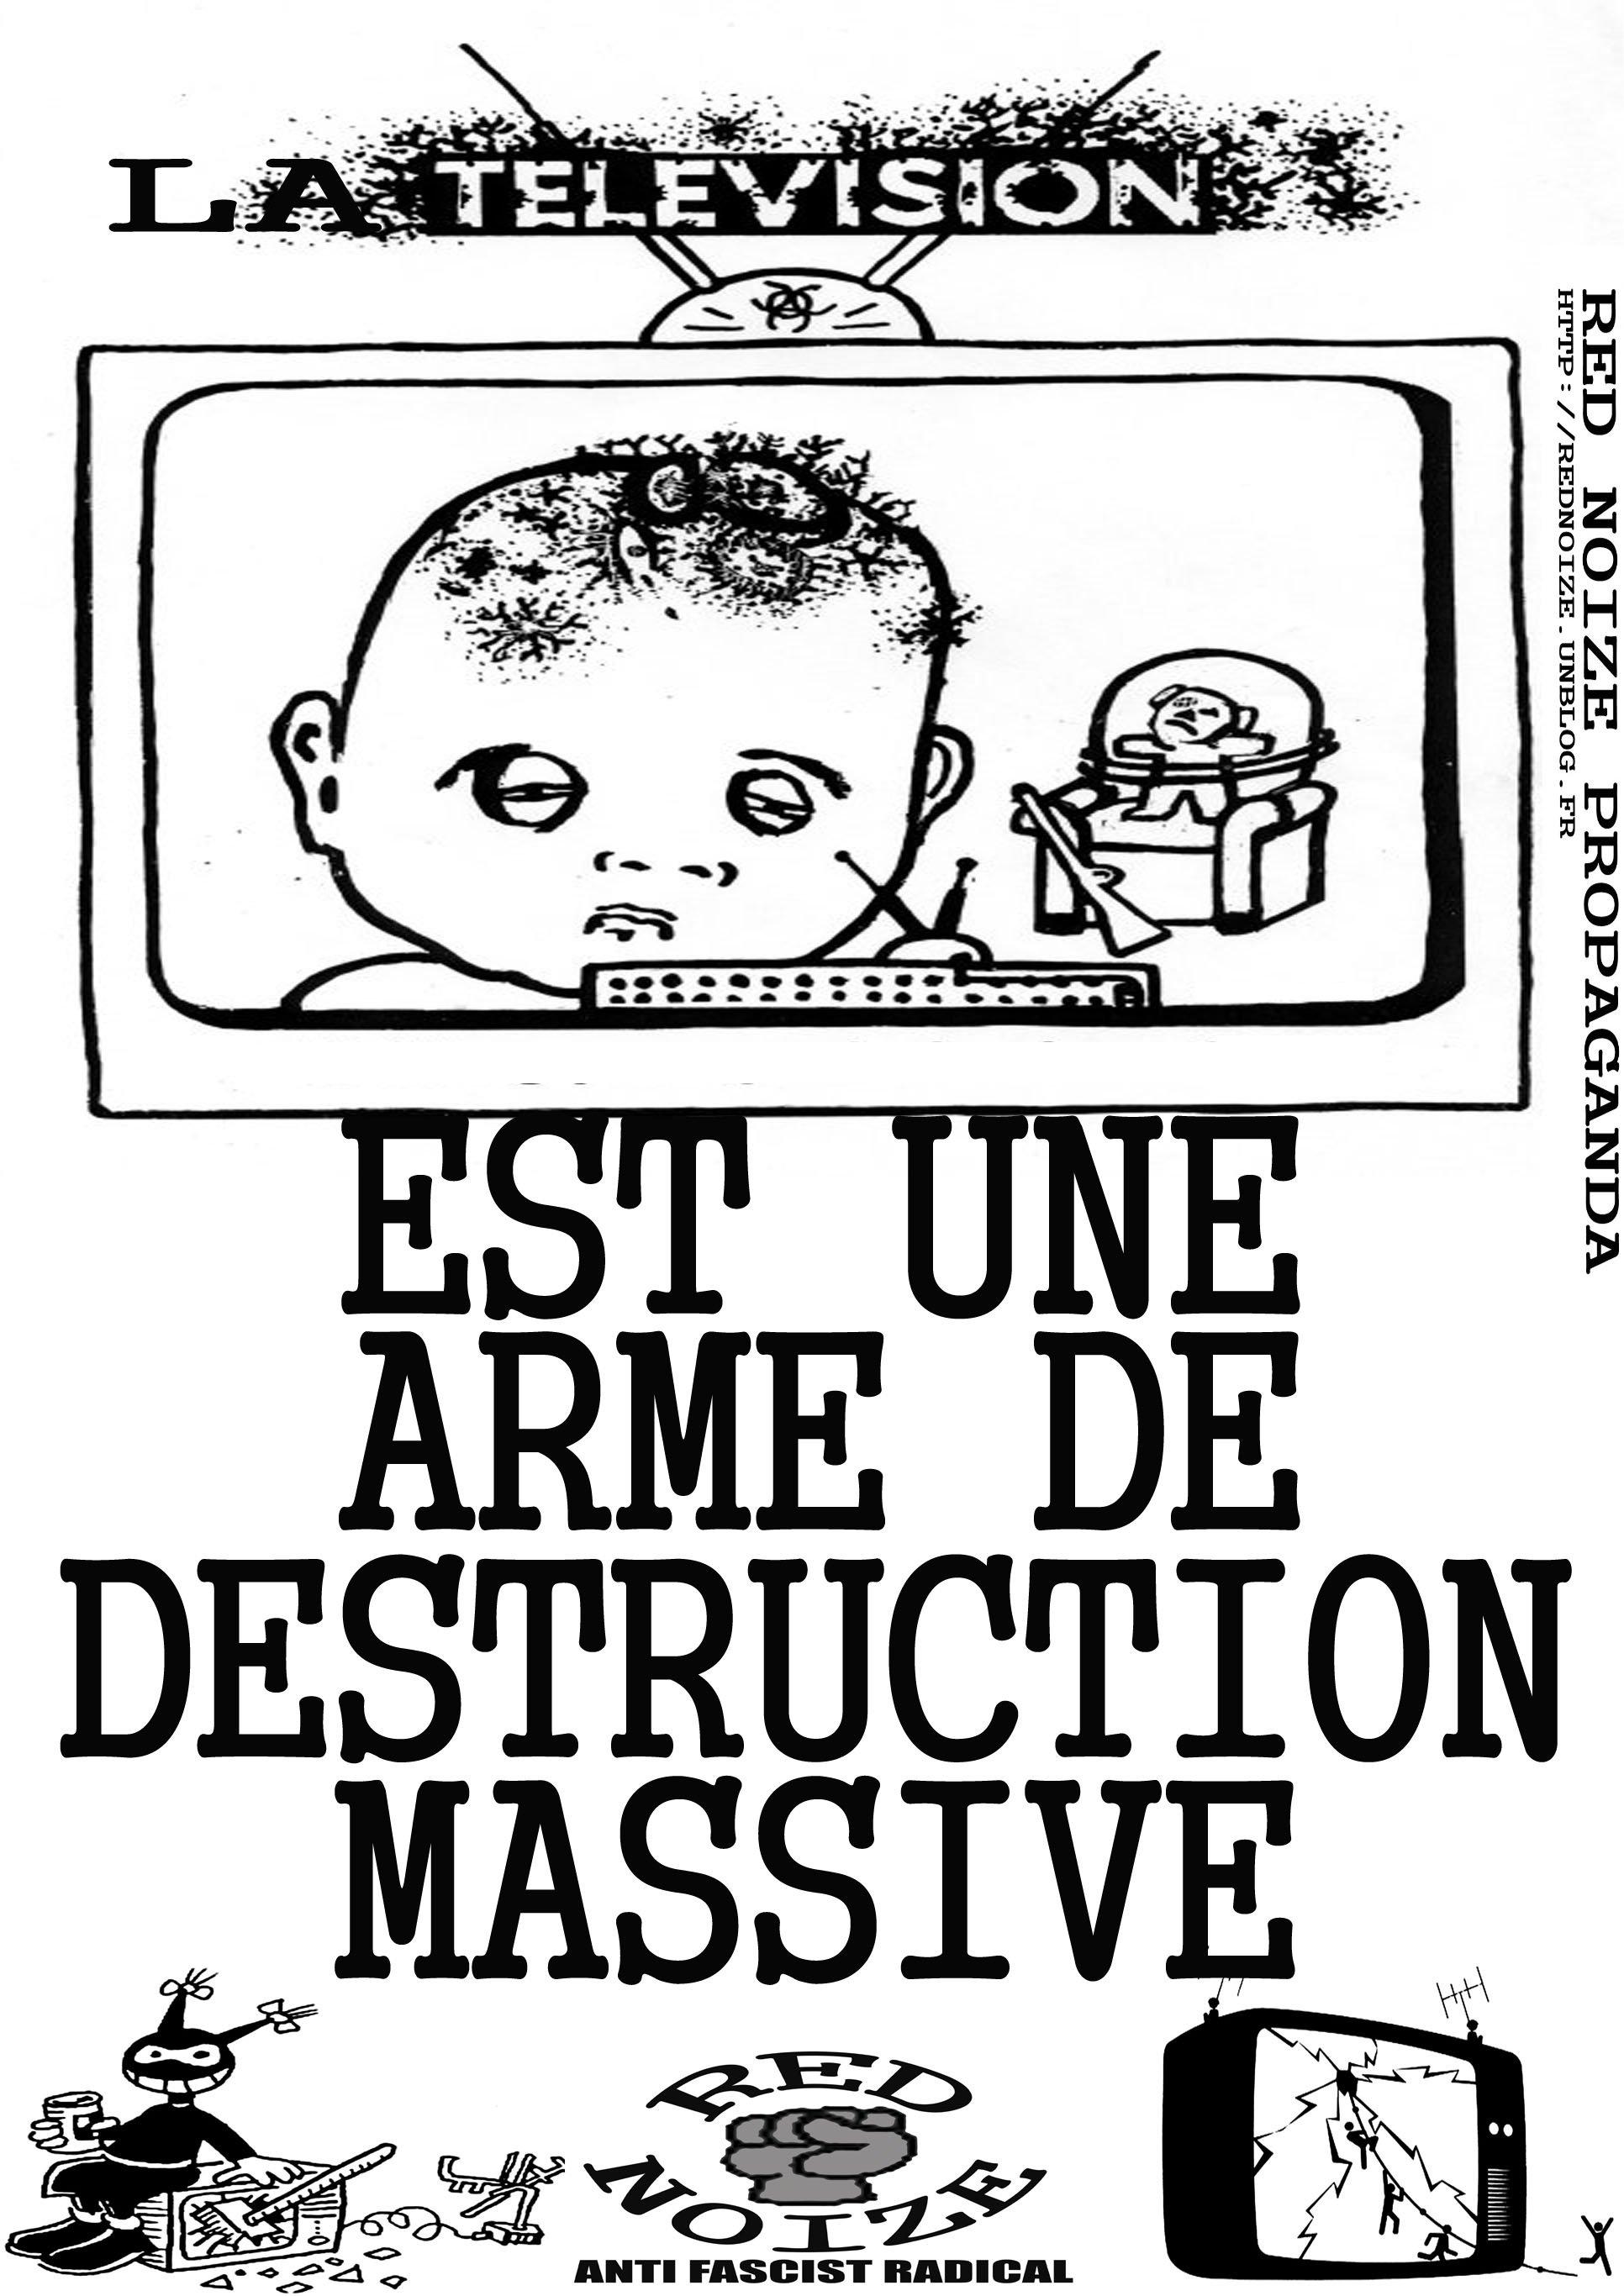 http://rednoize.e.r.f.unblog.fr/files/2007/05/tvdestructionmassivecopier.jpg